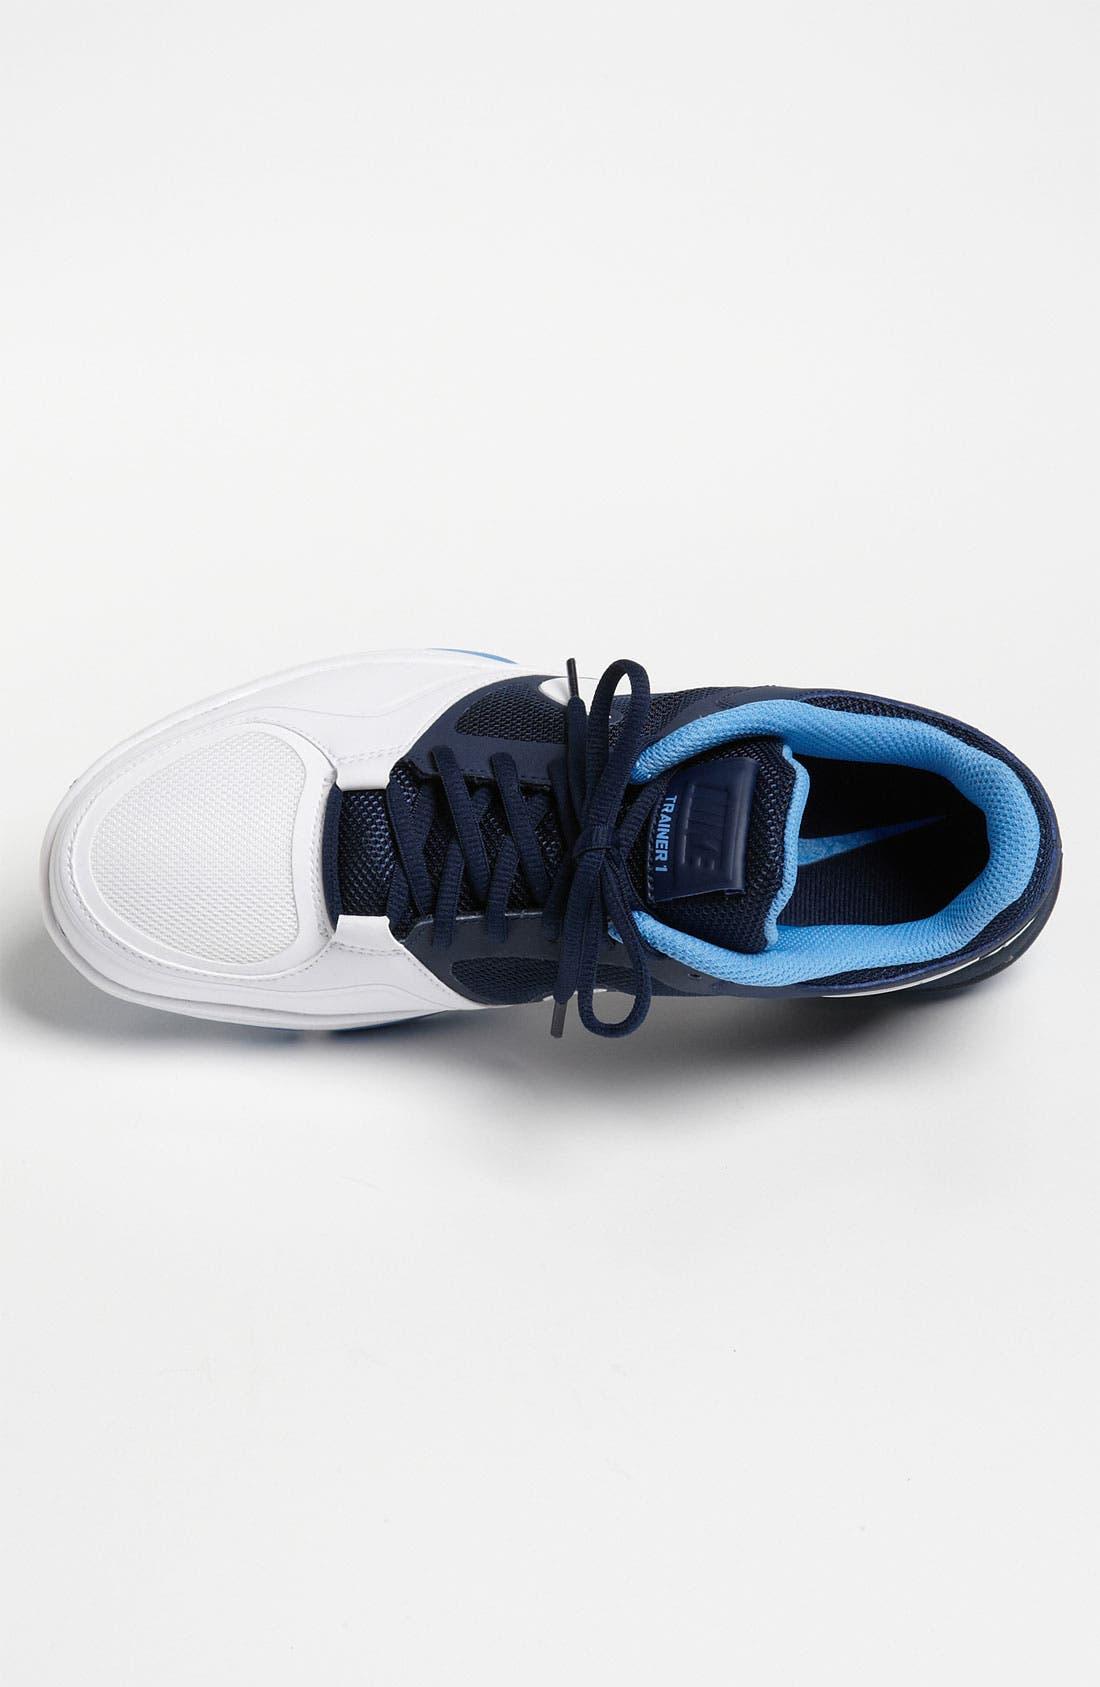 NIKE,                             'Trainer 1.3 Low' Training Shoe,                             Alternate thumbnail 4, color,                             414